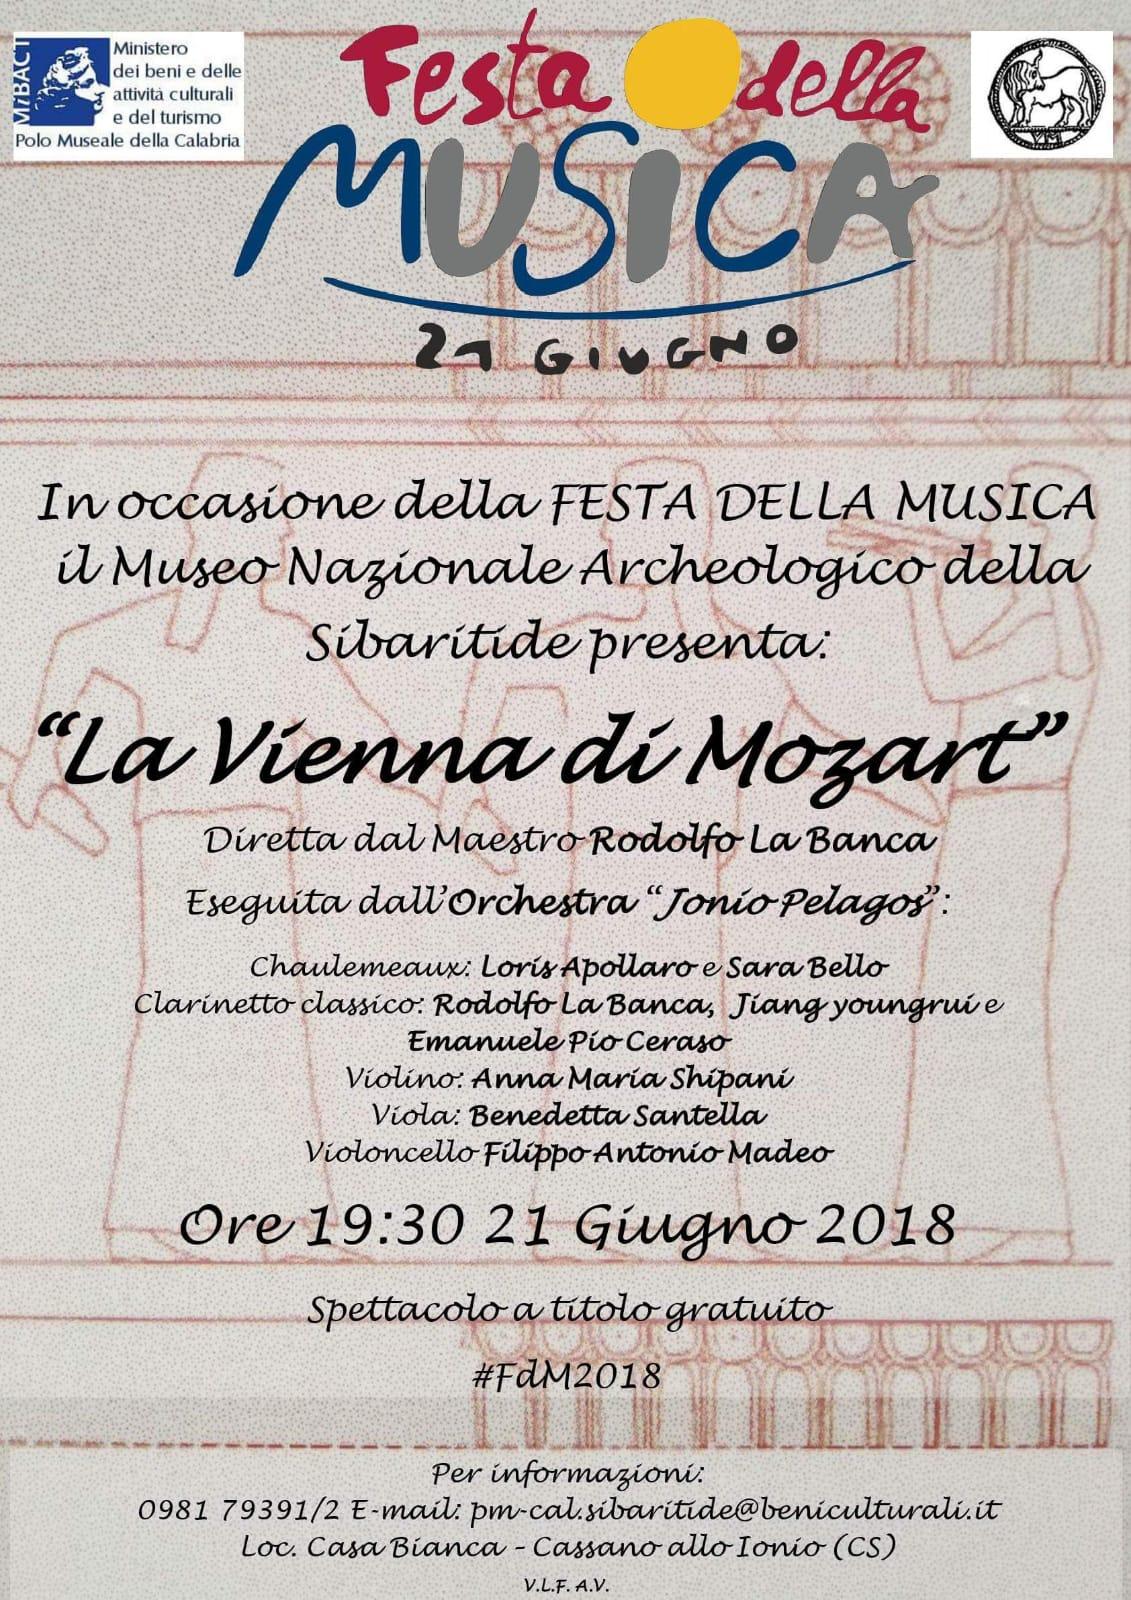 La Vienna di Mozart